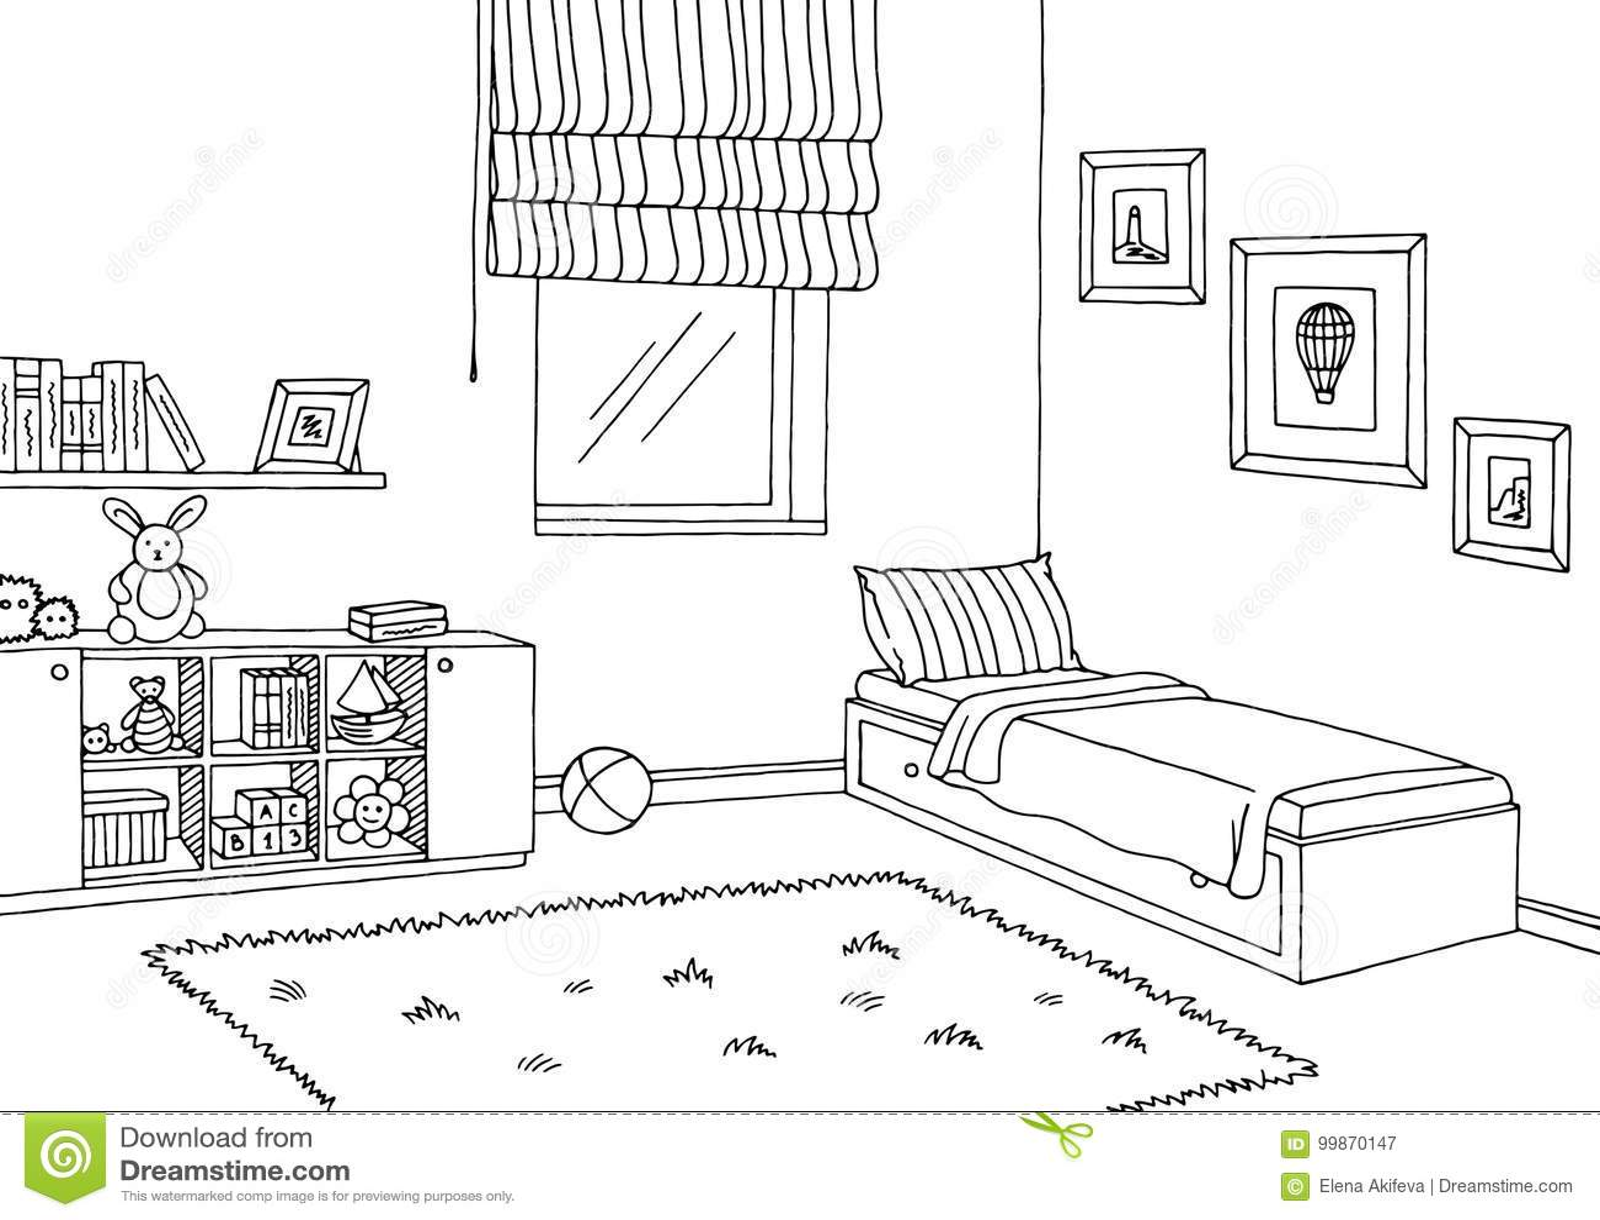 Children Room Graphic Black White Interior Sketch